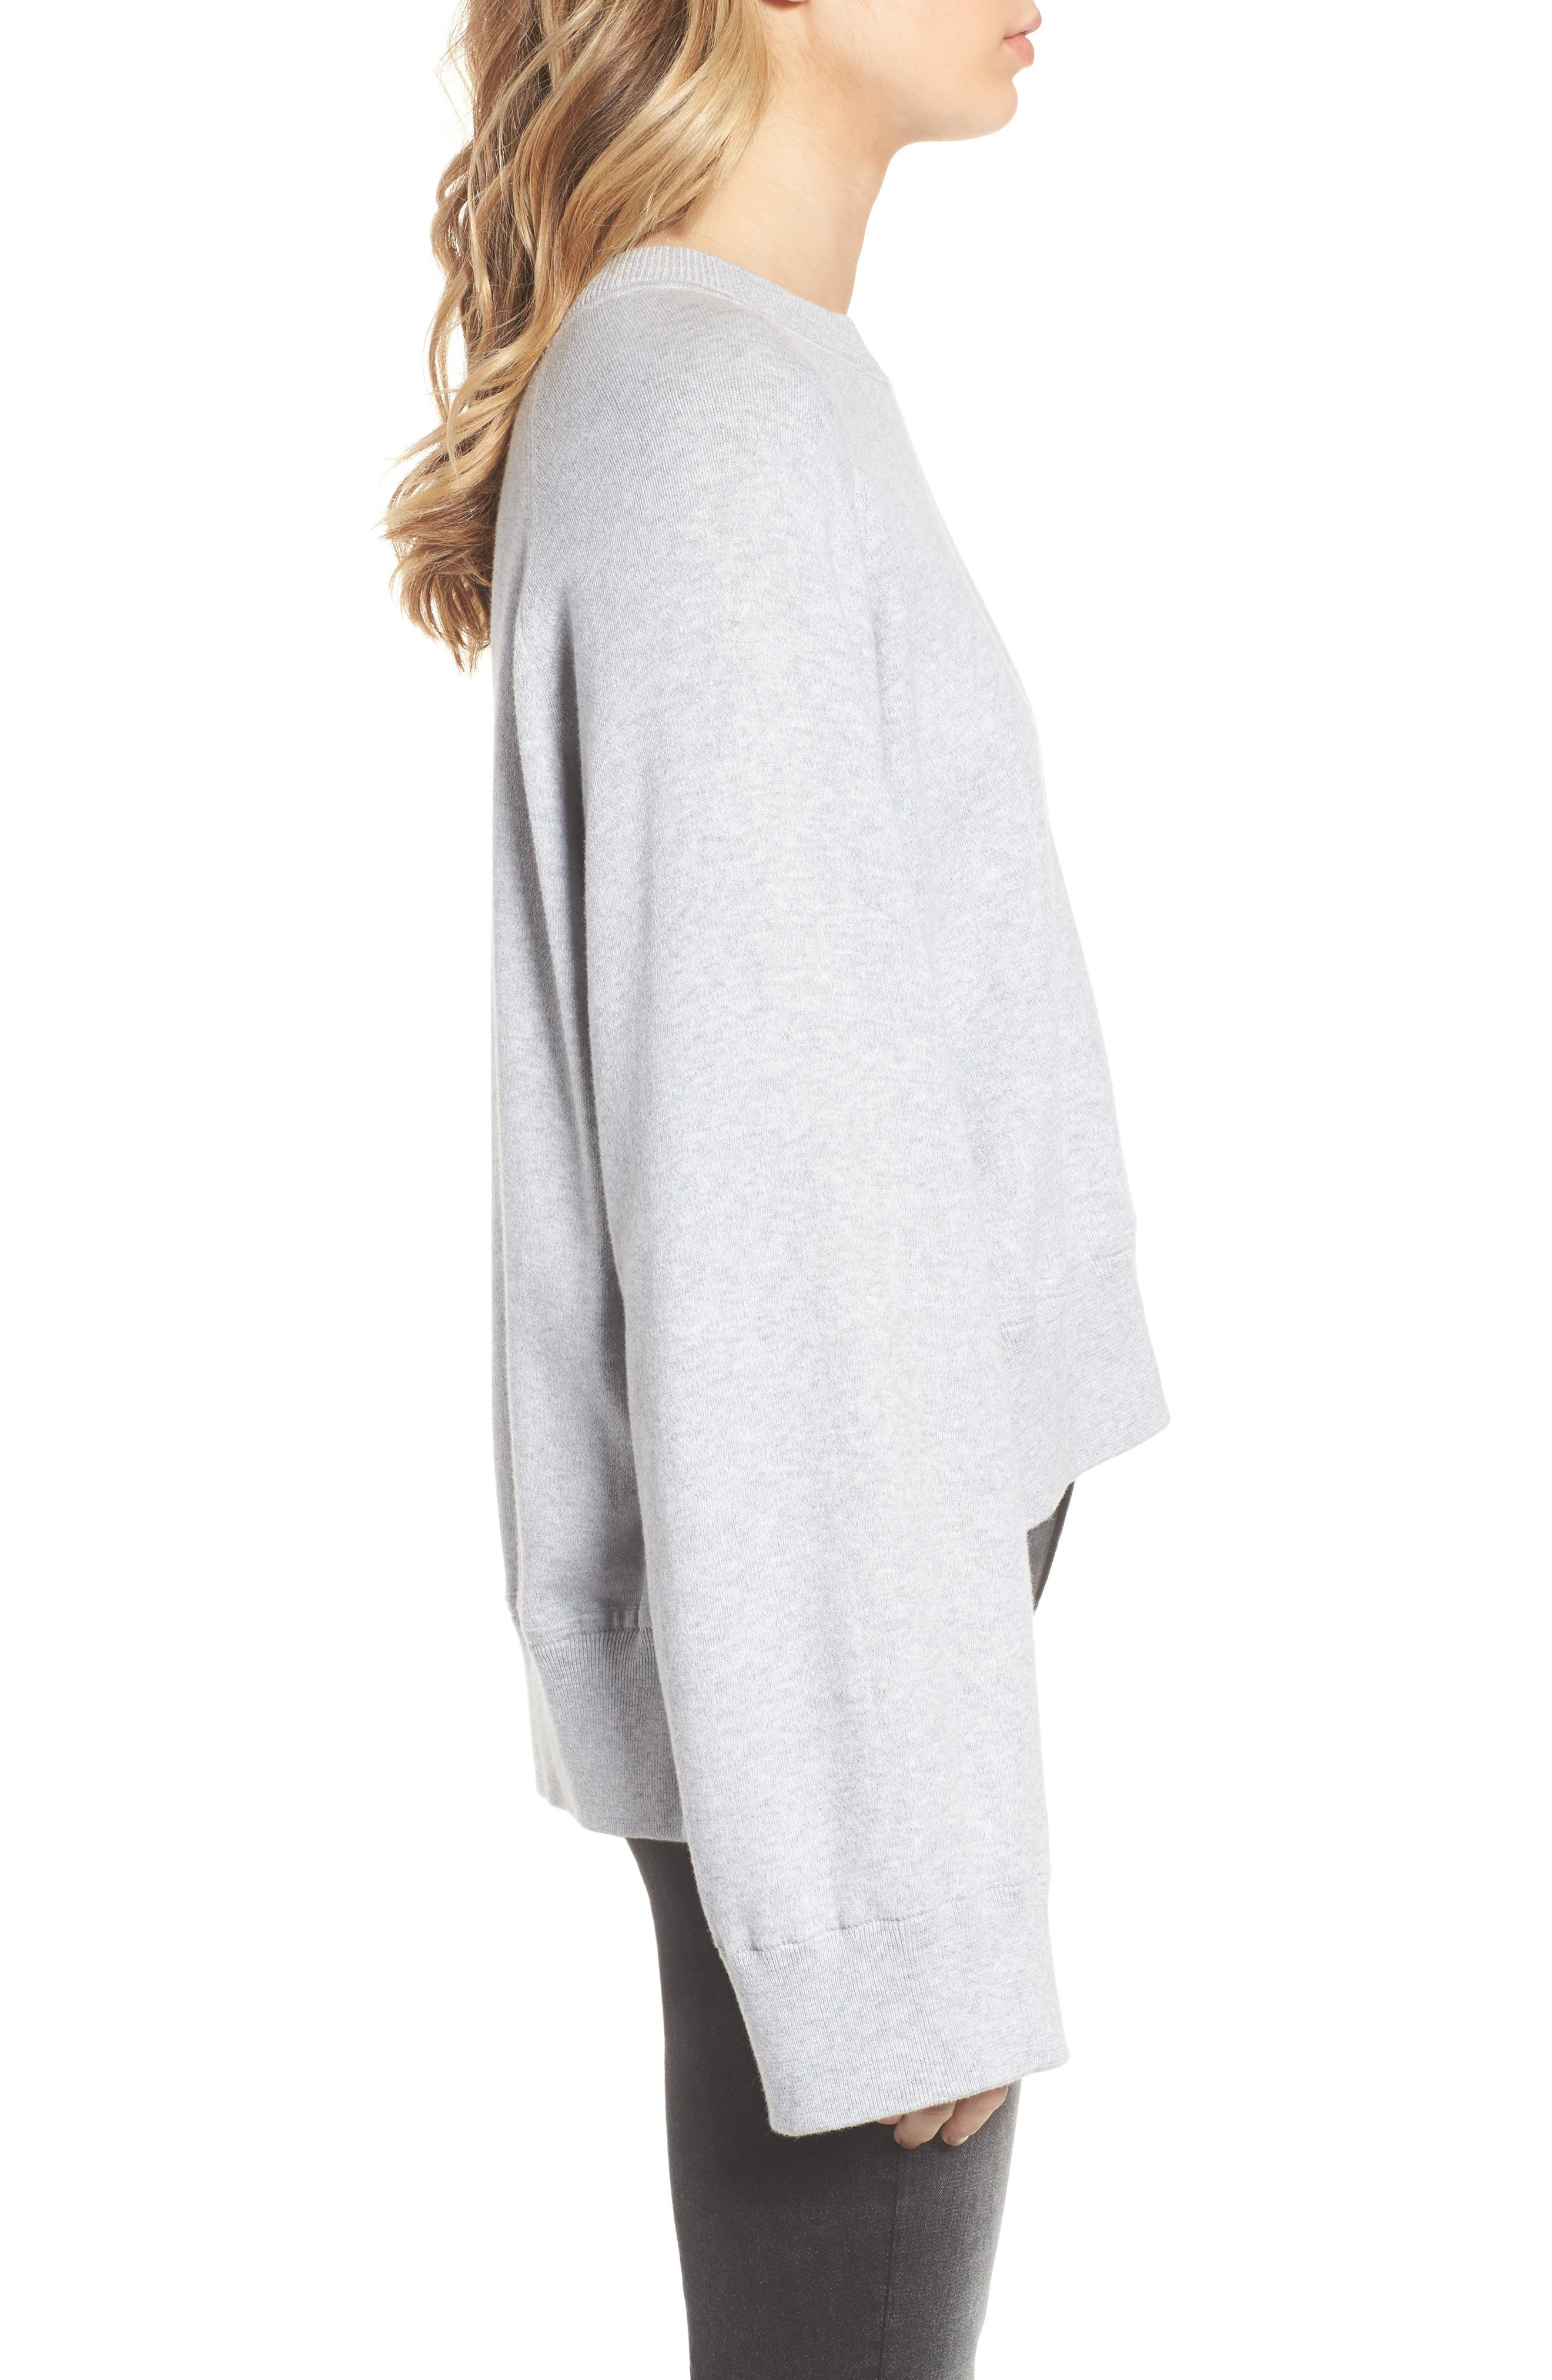 Lea Sweatshirt,                             Alternate thumbnail 3, color,                             Grey